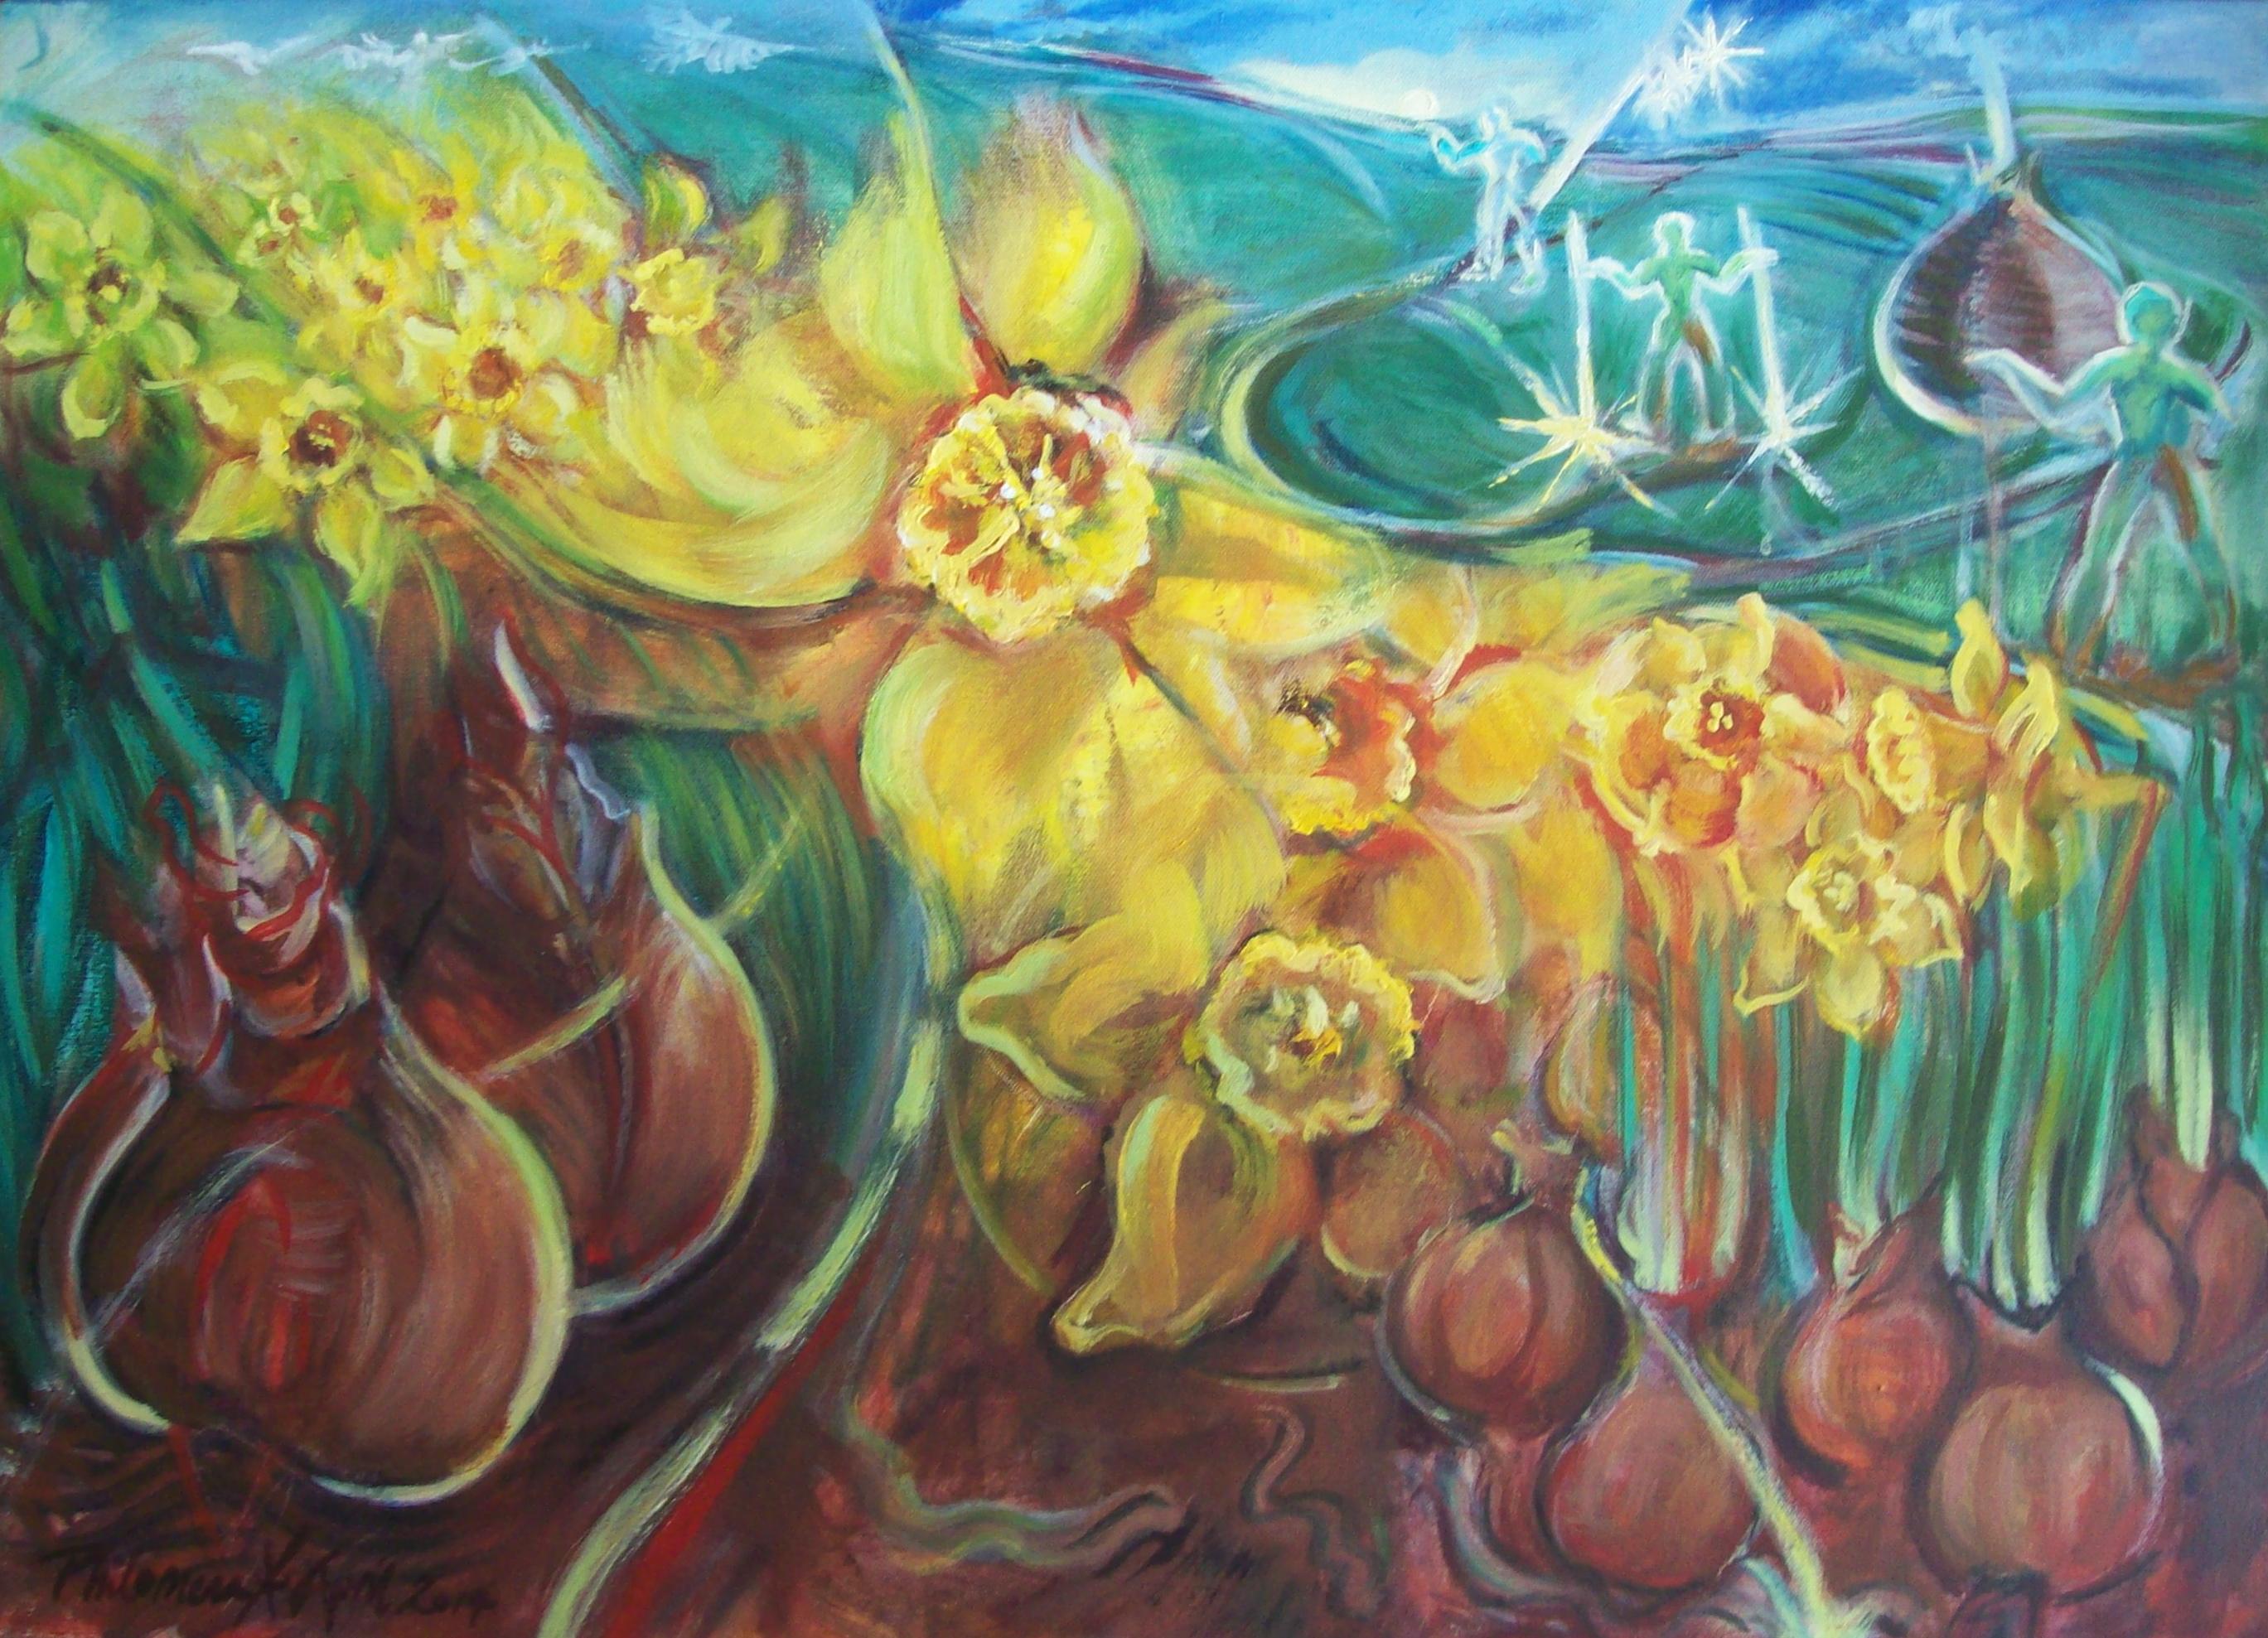 The Celestial Gardener, painting by Philomena Harmsworth